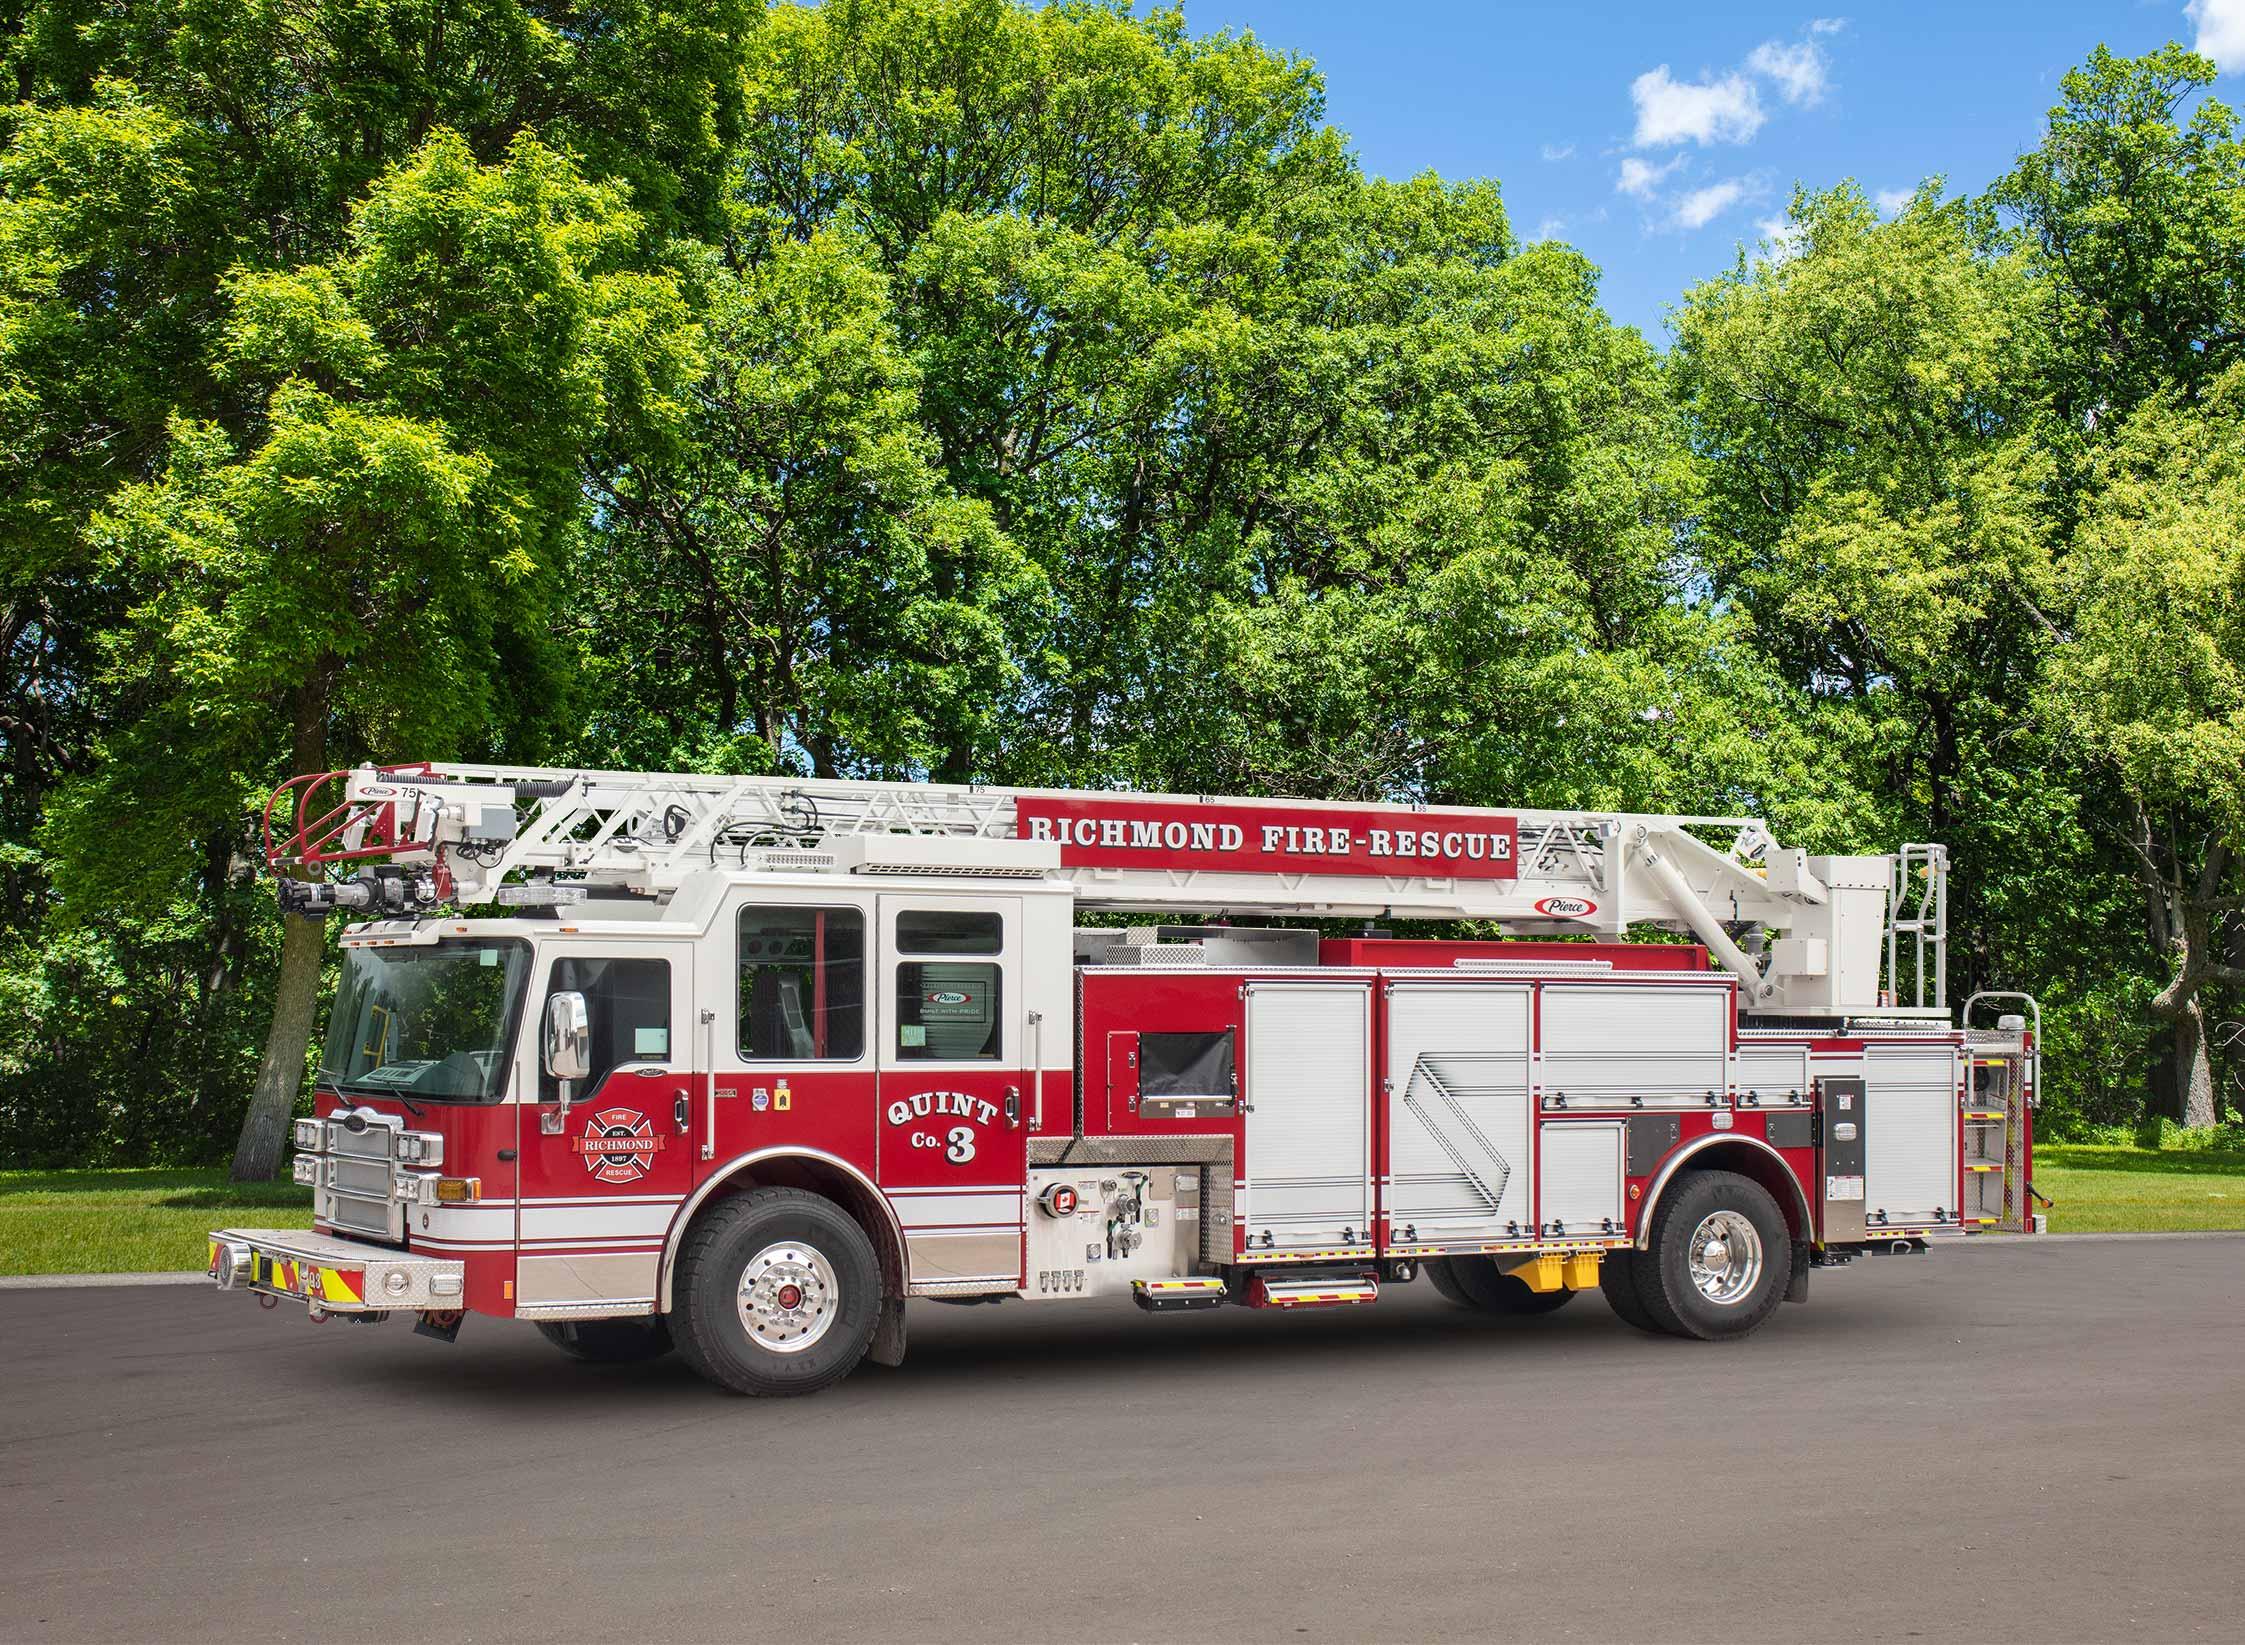 Richmond Fire Rescue - Aerial